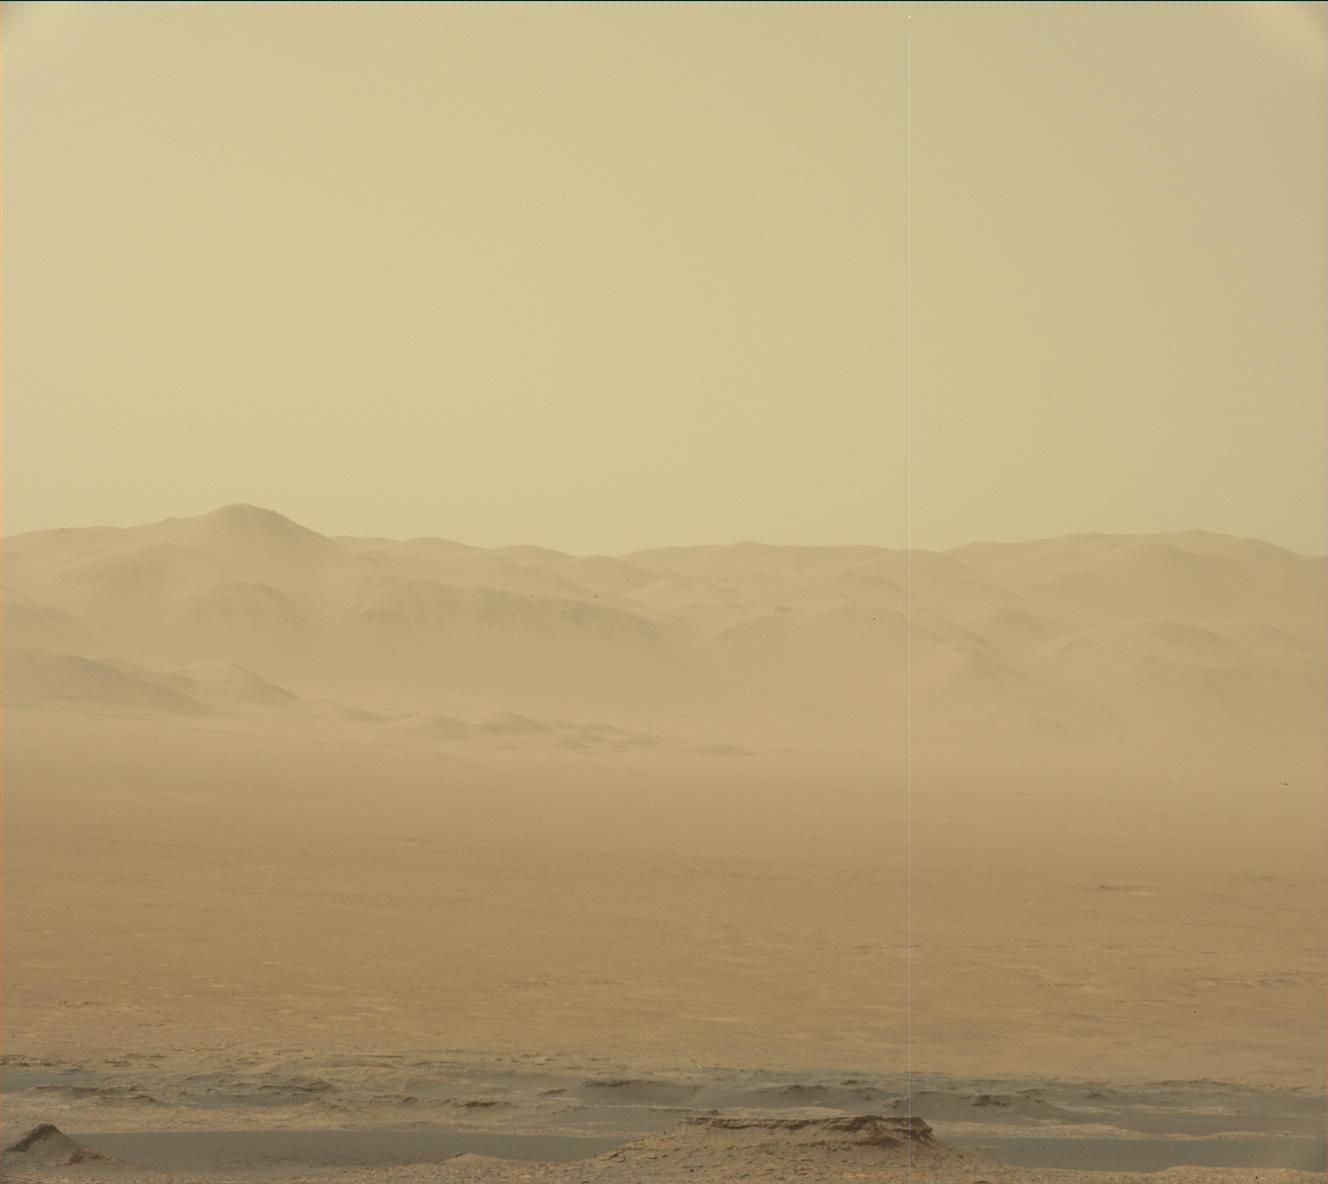 Sol 2076-2078: Dust on the horizon